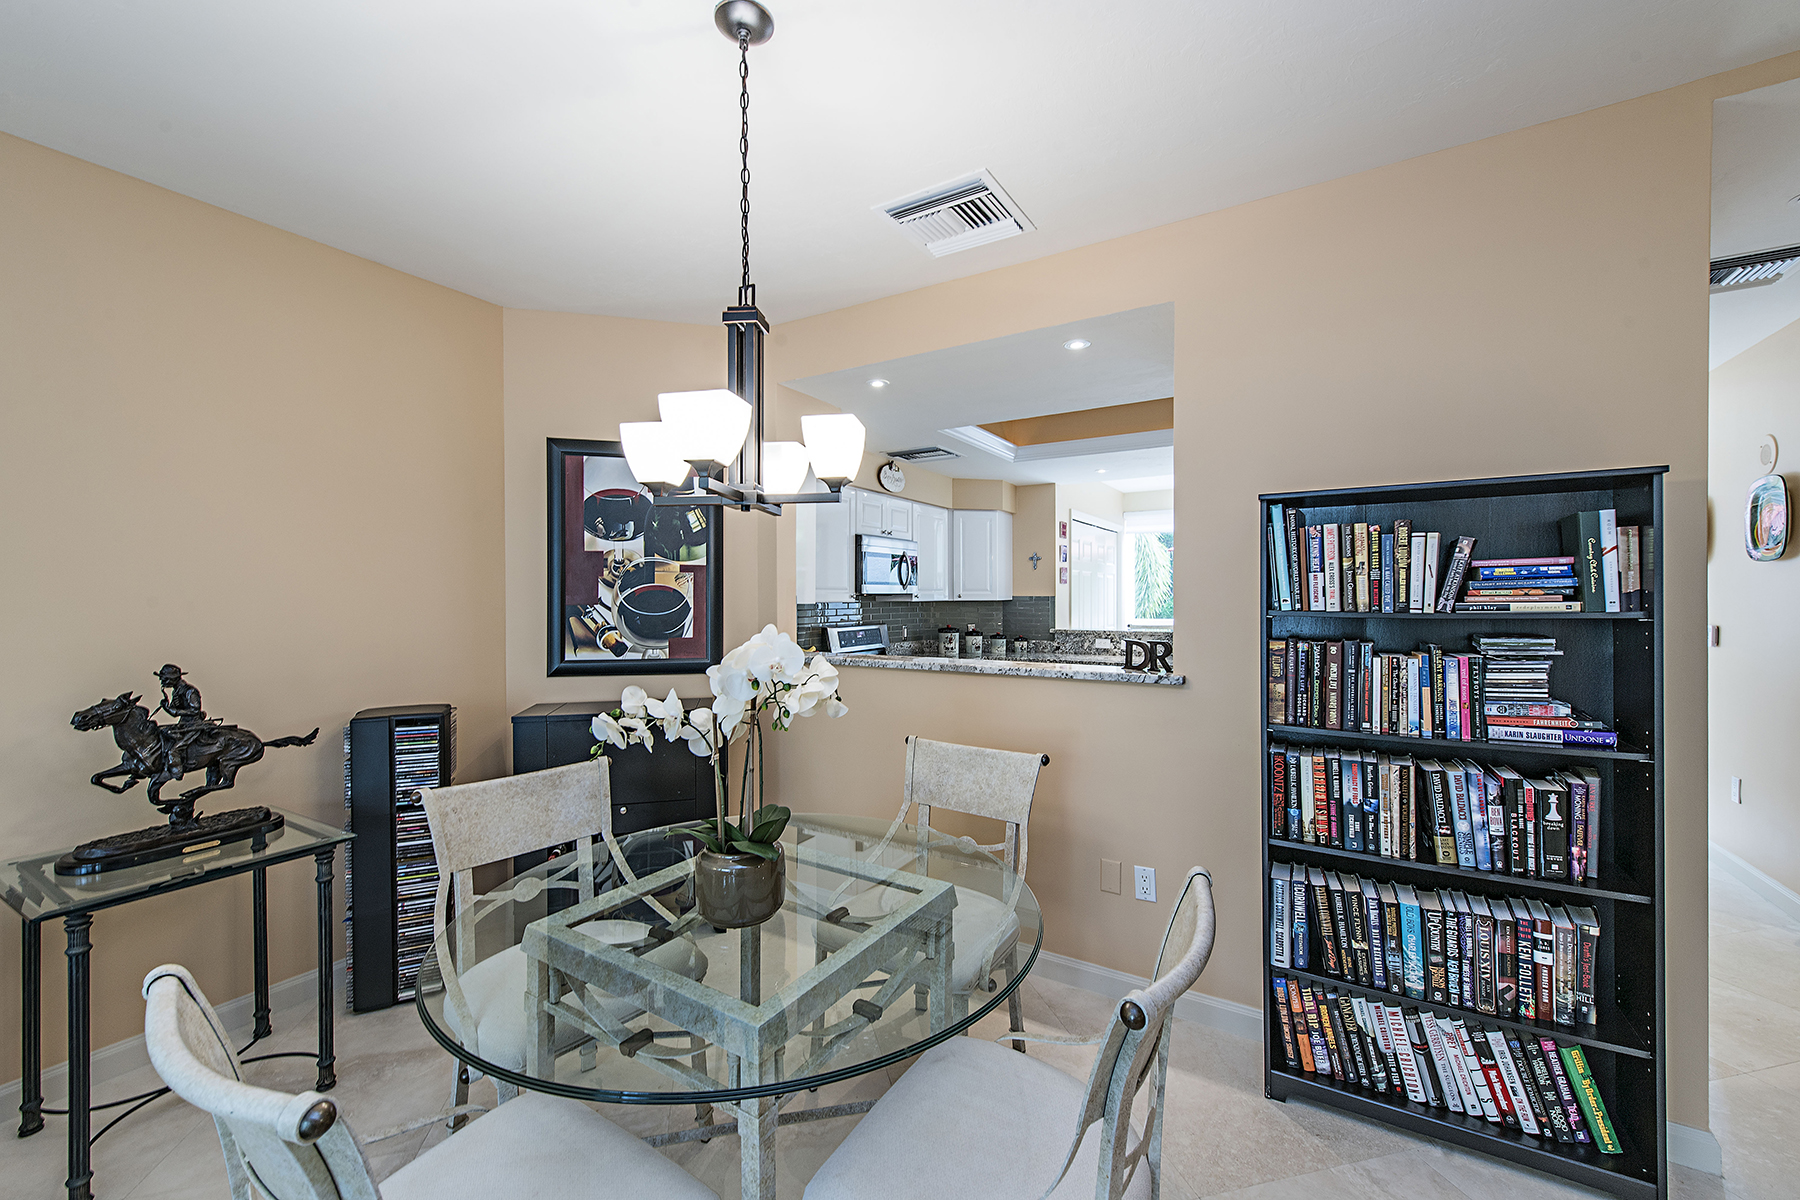 Additional photo for property listing at PELICAN BAY - ST RAPHAEL 7083  Pelican Bay Blvd V-11,  那不勒斯, 佛罗里达州 34108 美国